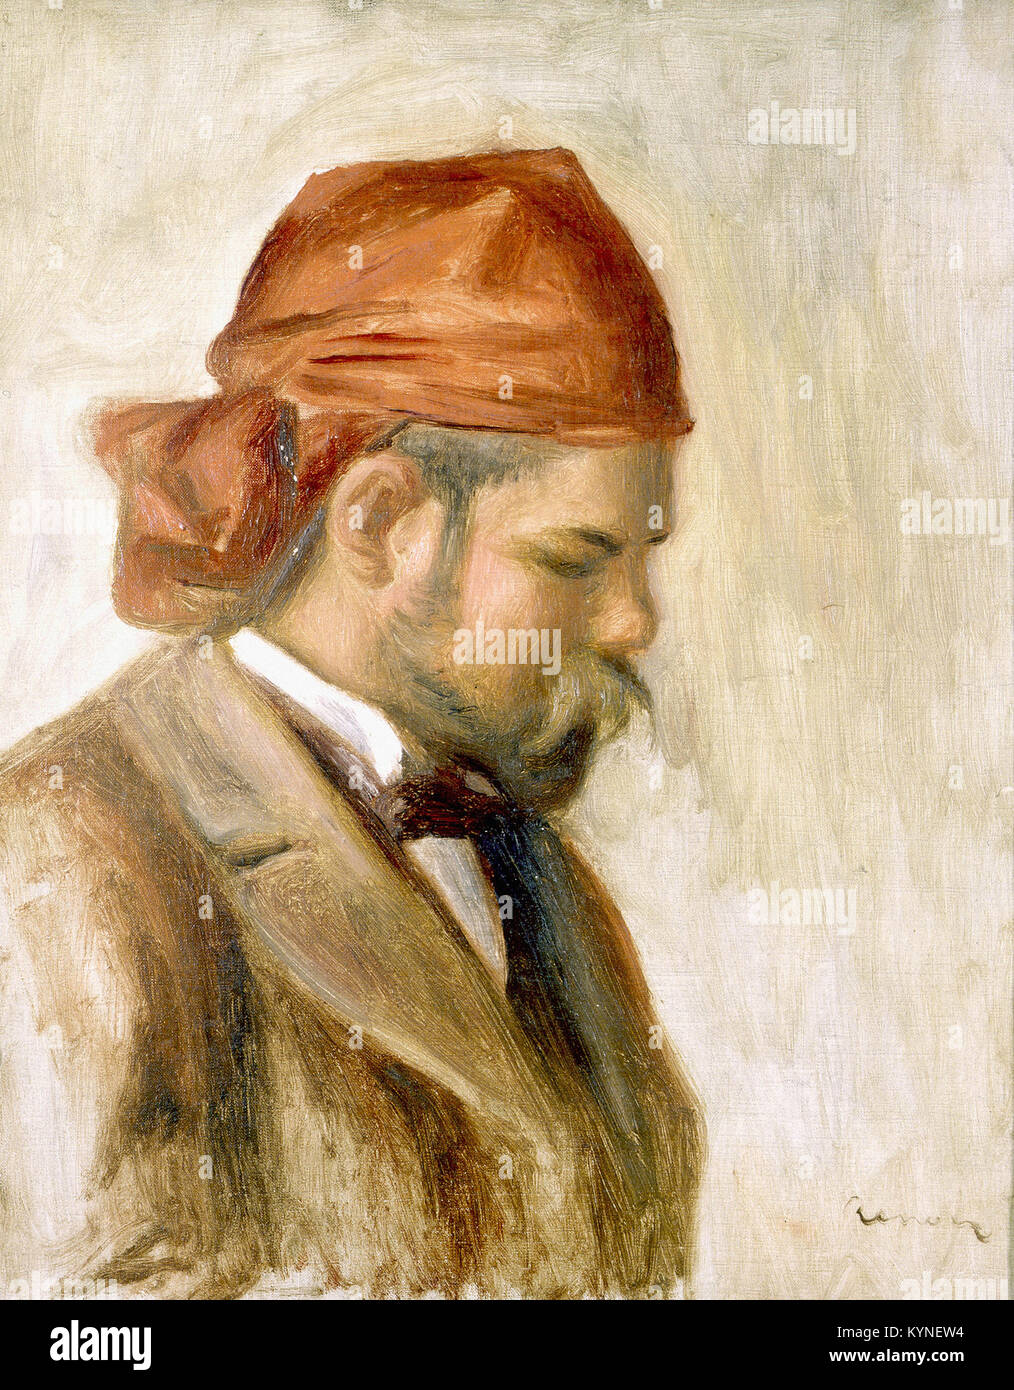 Pierre-Auguste Renoir - Ambroise Vollard in a Red Scarf - Stock Image